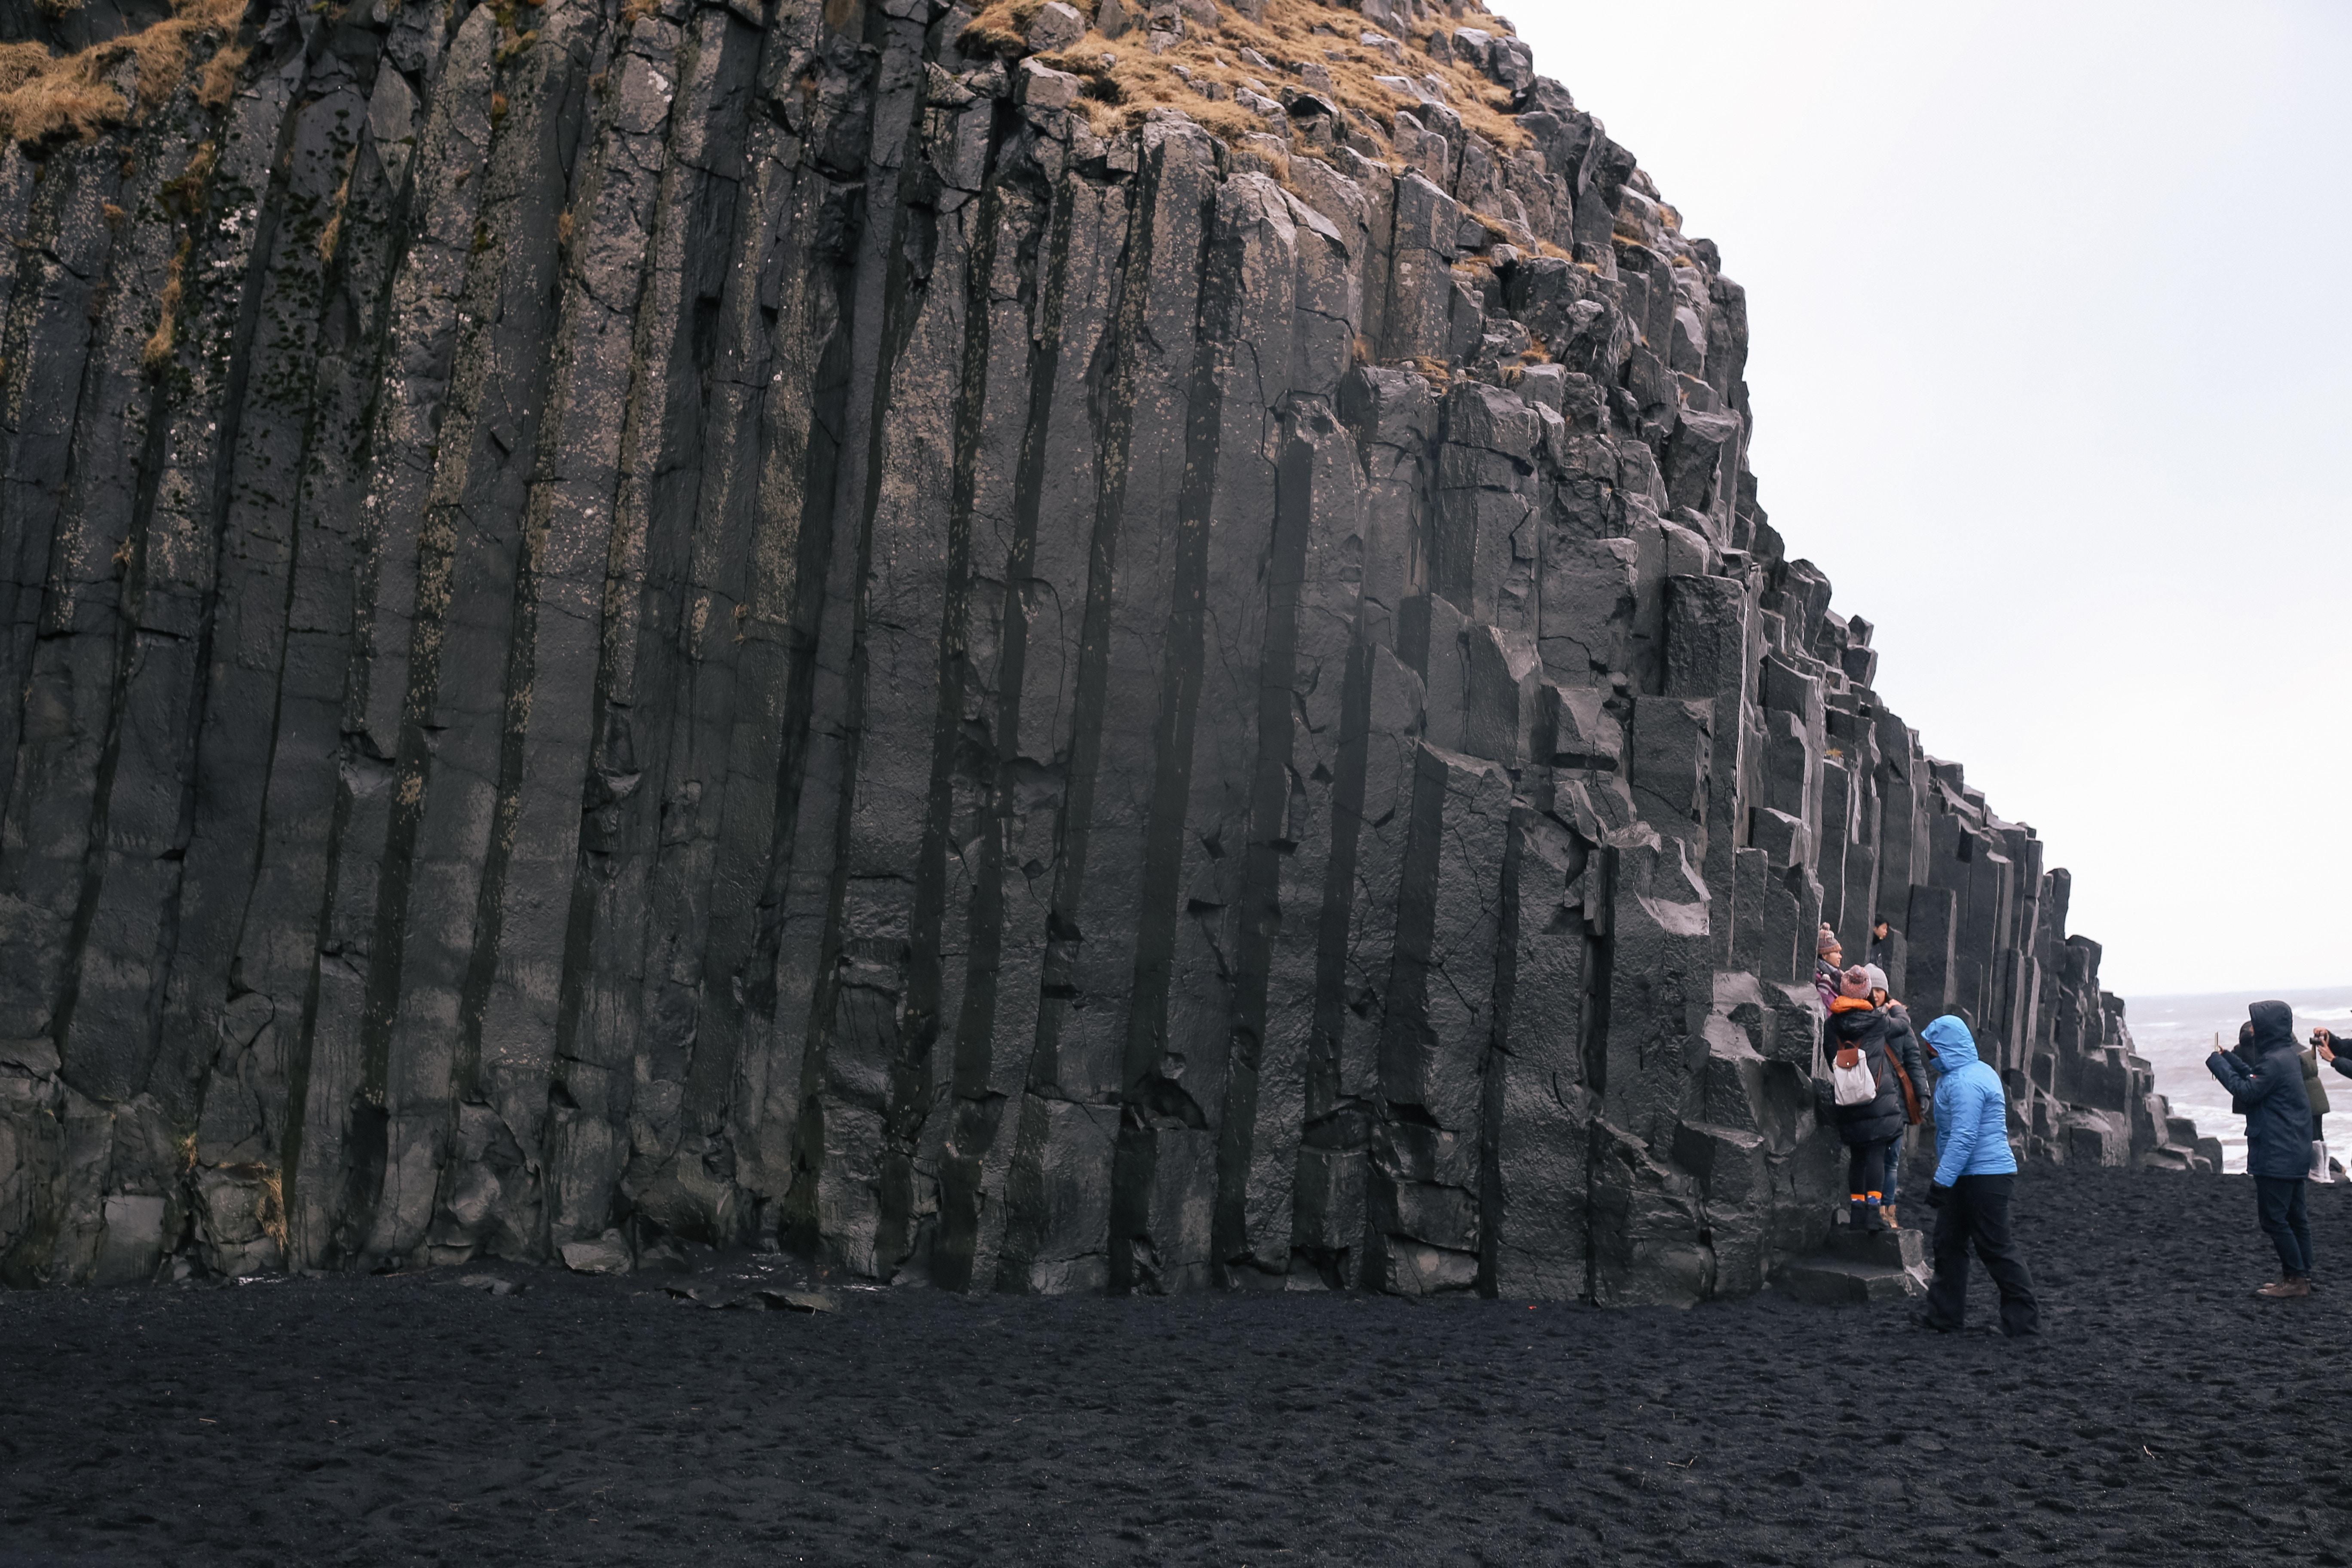 Southern Iceland Vik Travel Itinerary: Impressive basalt columns at Reynisfjara Beach aka Iceland's black beach.